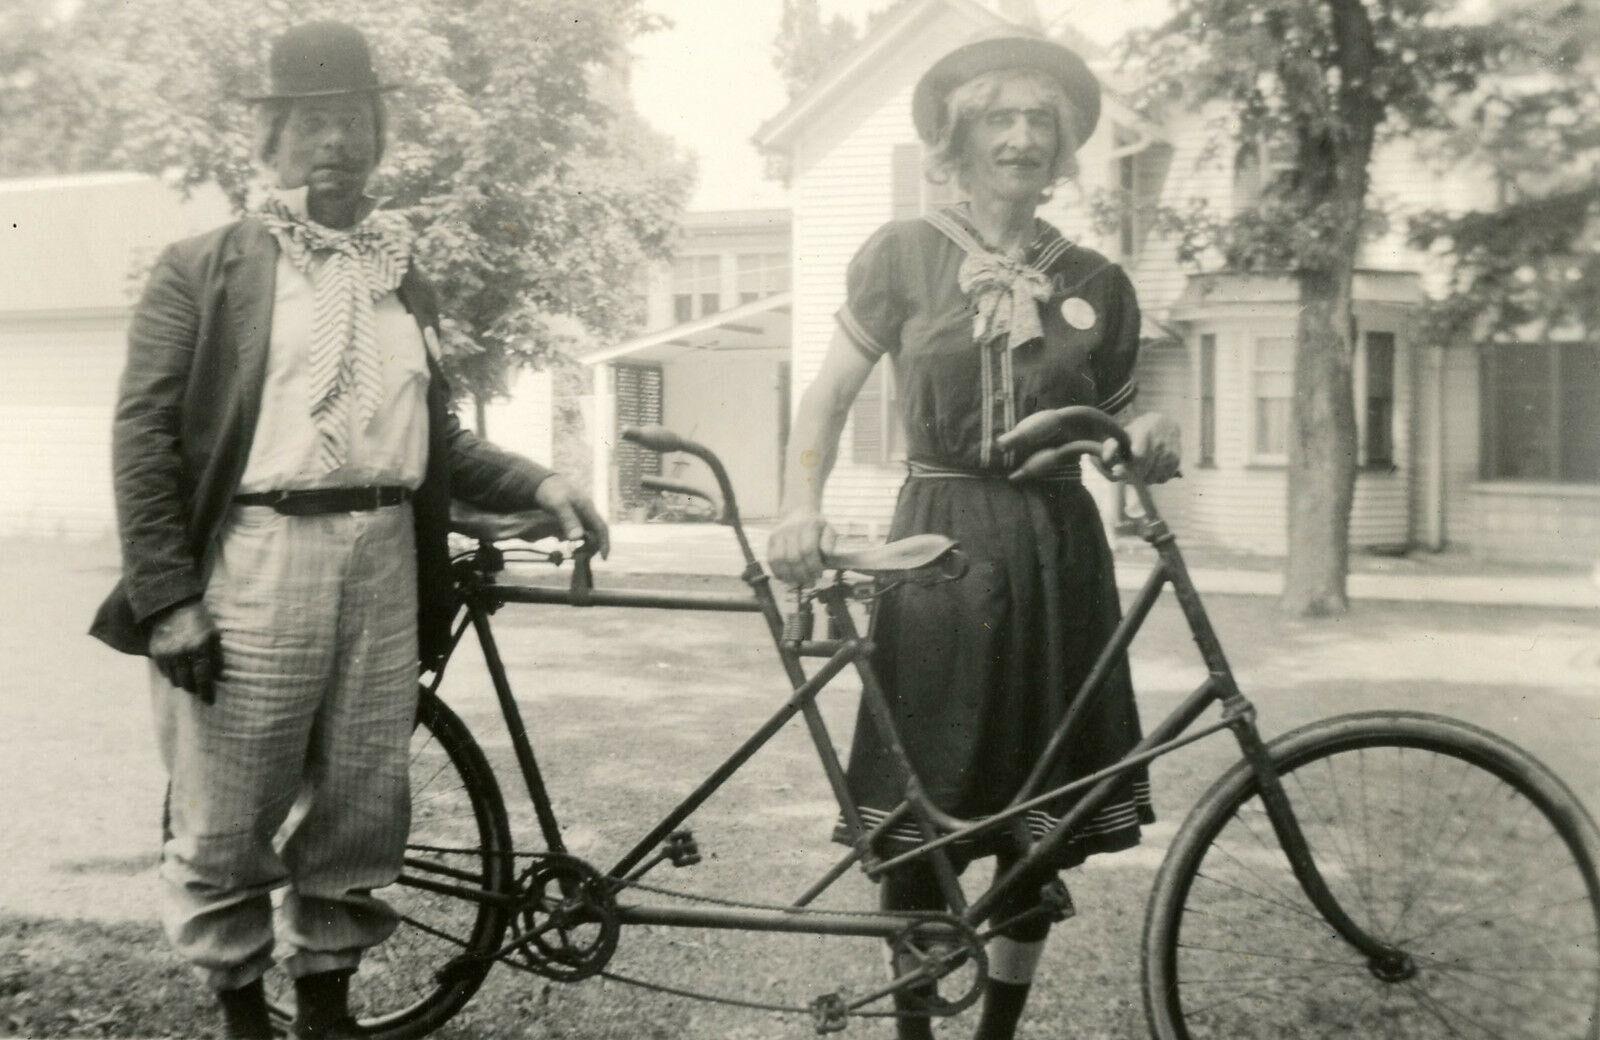 VINTAGE FUNNY UNUSUAL COSTUME TWIN BIKE BICYCLE BUILT TWO CLOWN CROSSDRESS PHOTO   [ ]